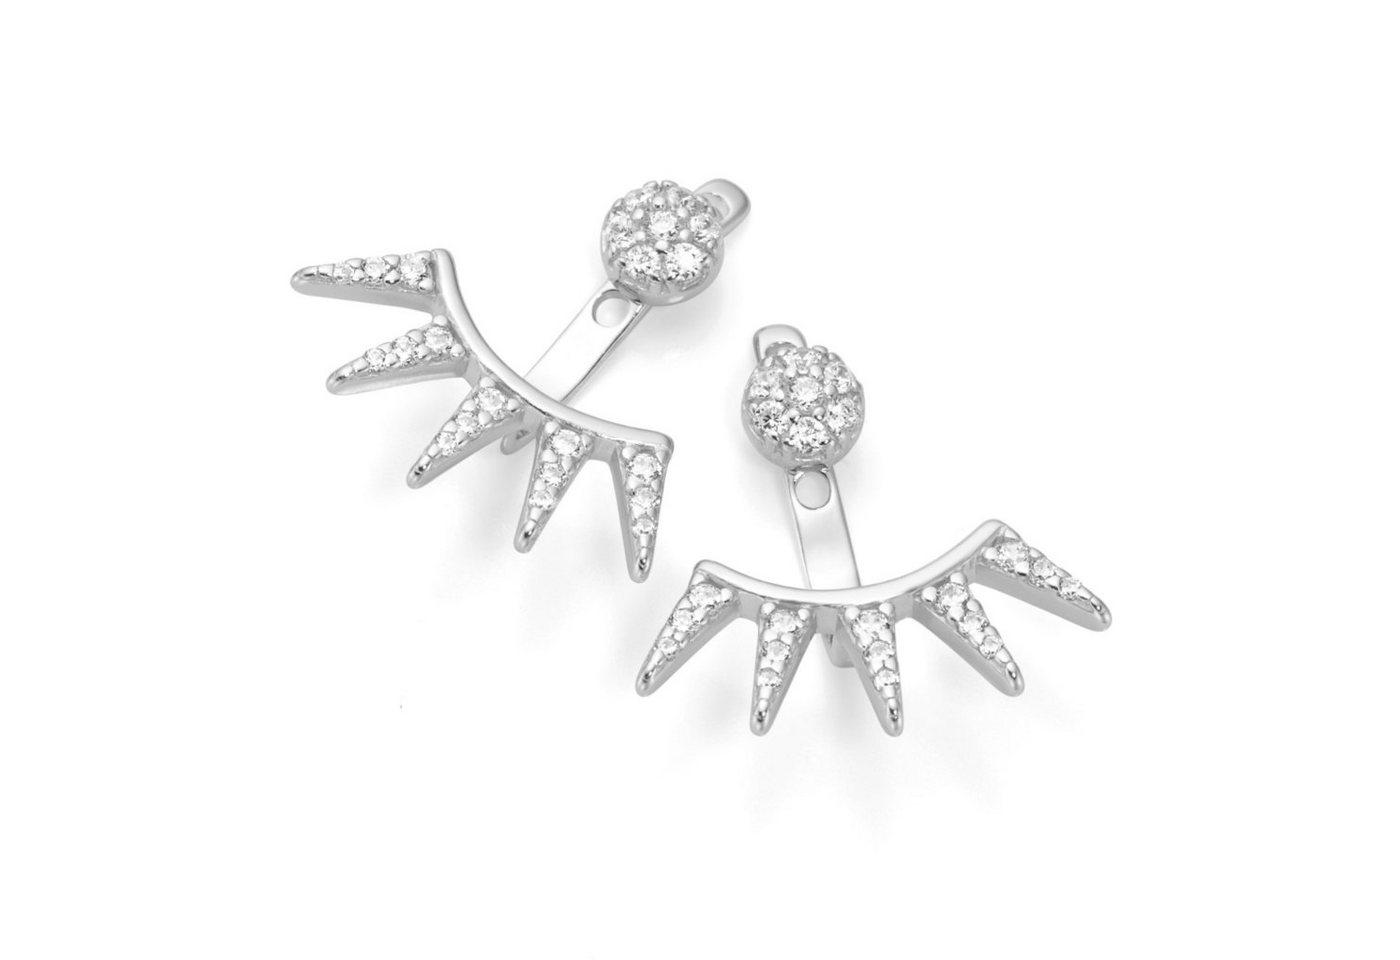 Smart Jewel Paar Ohrstecker »2-teilig Einhänger mit Zacken, Silber 925«   Schmuck > Ohrschmuck & Ohrringe > Ohrstecker   Weiß   Smart Jewel